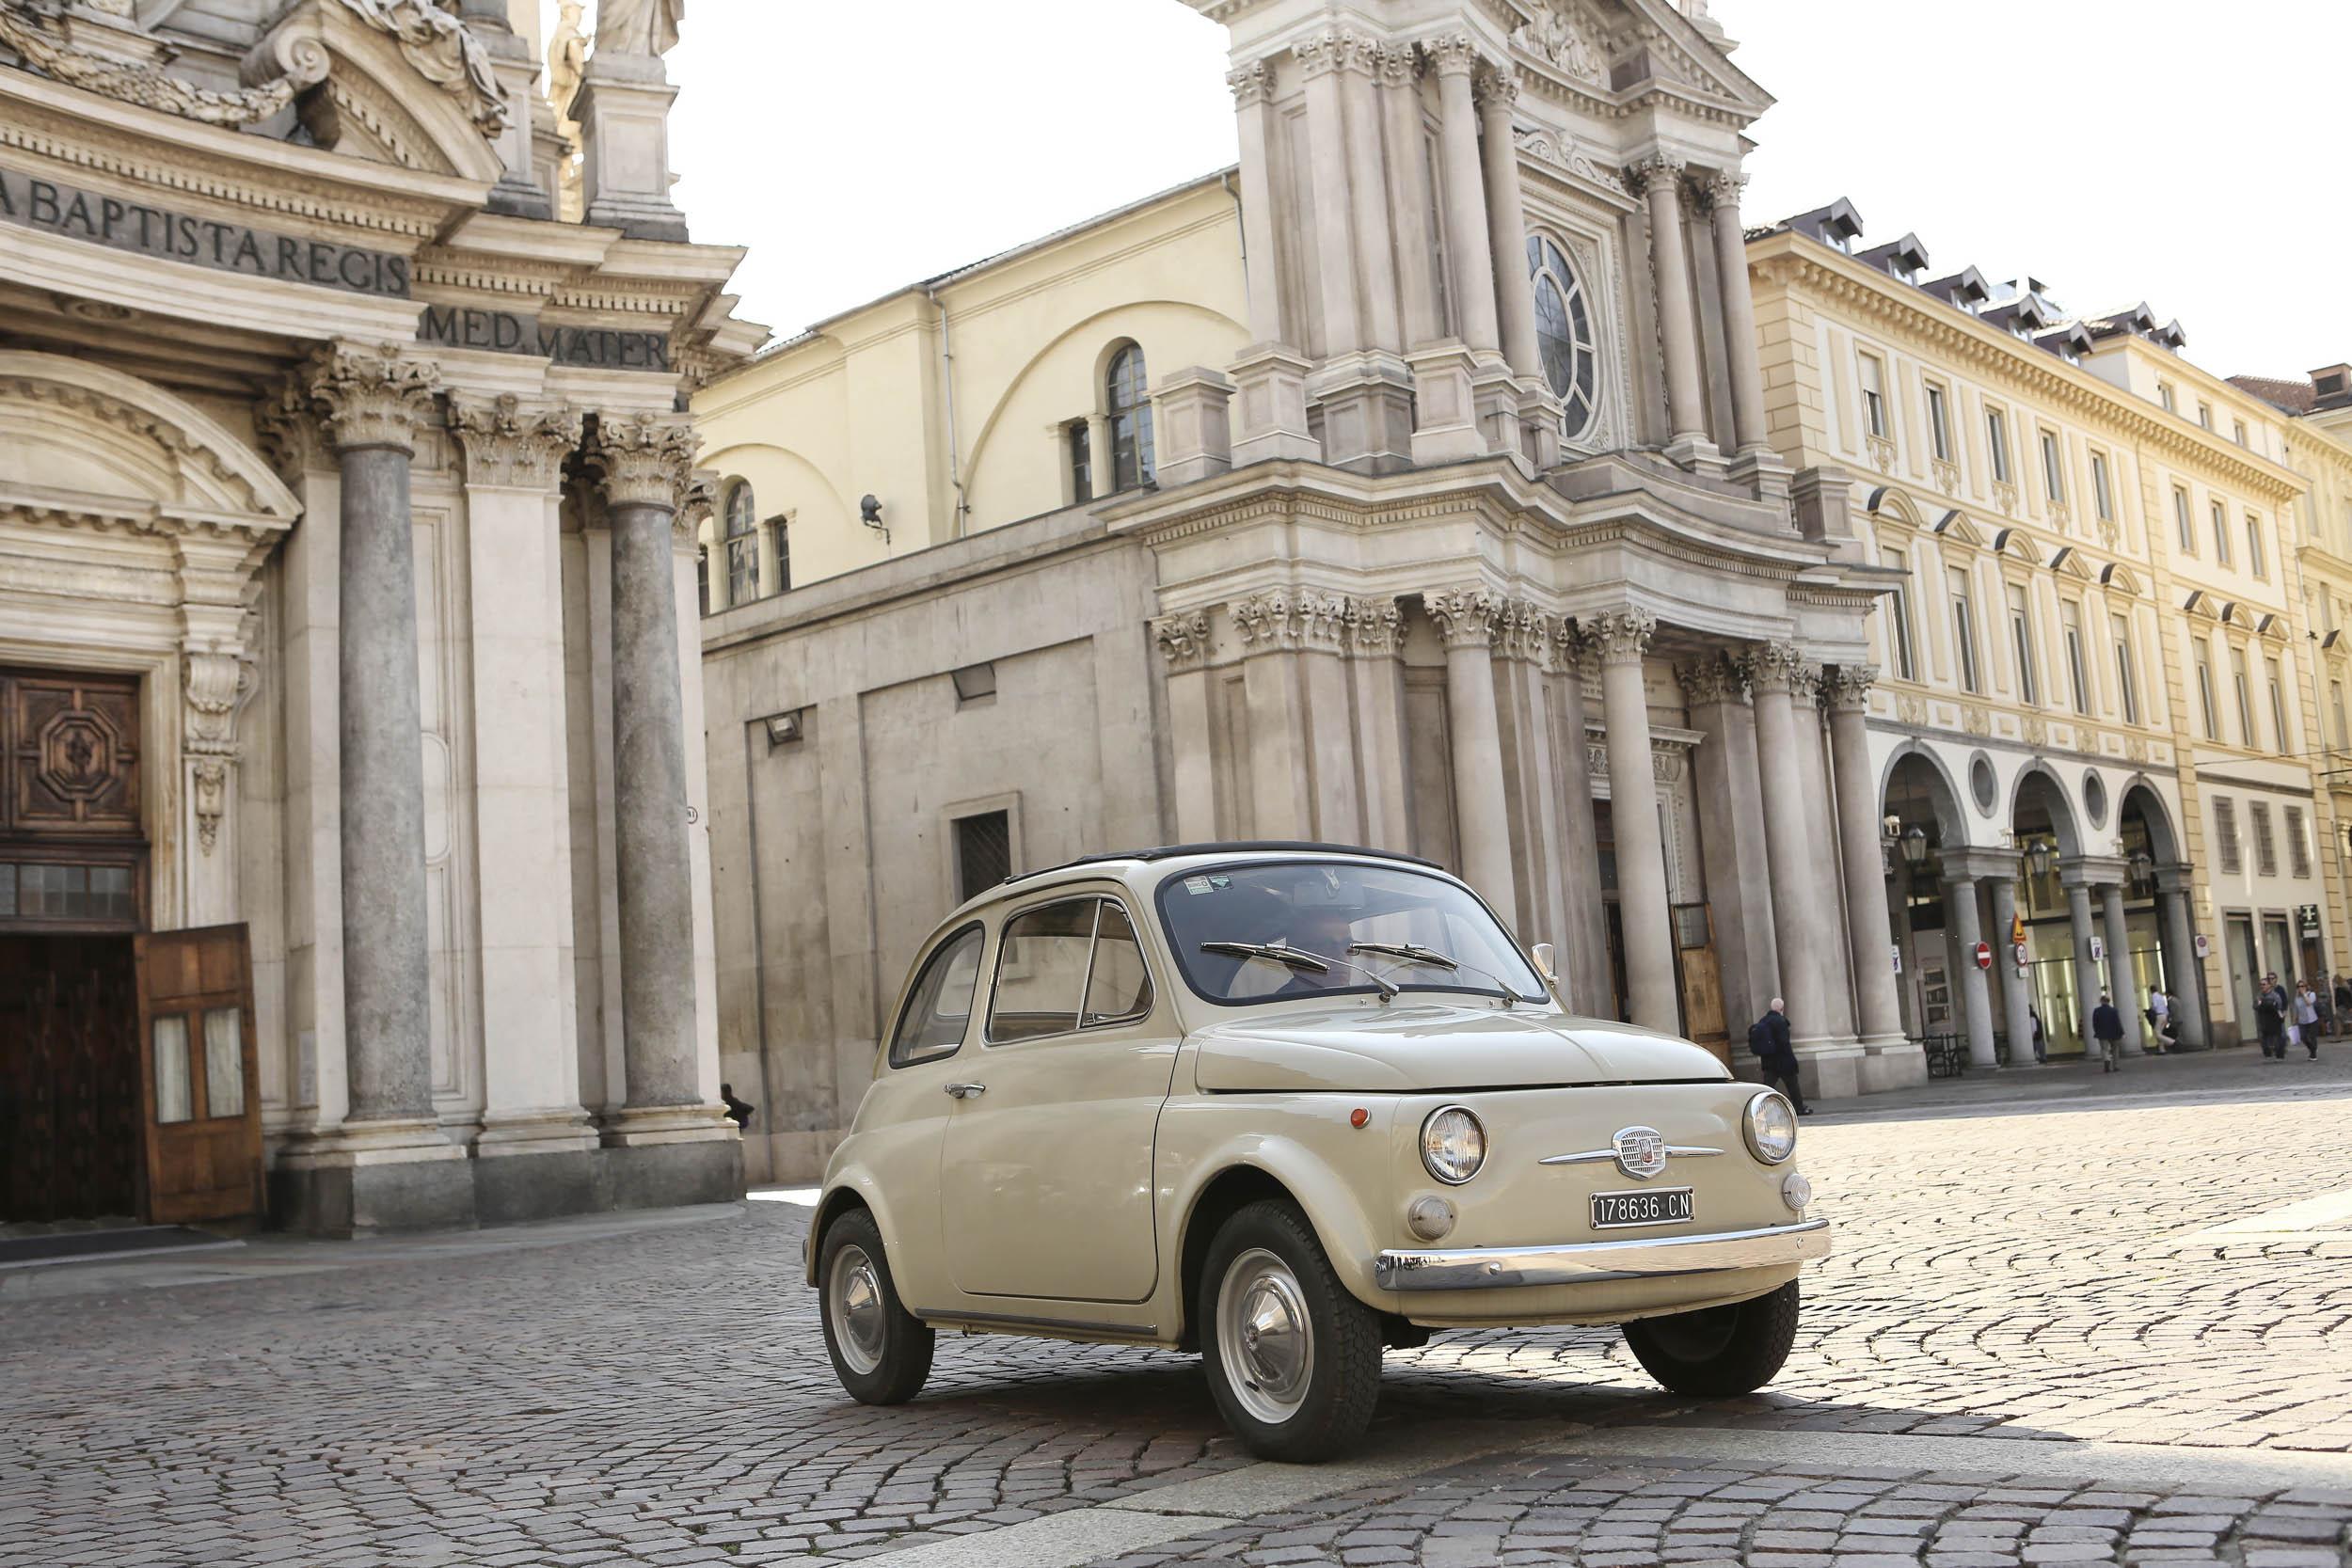 FIAT 500 F in Italy